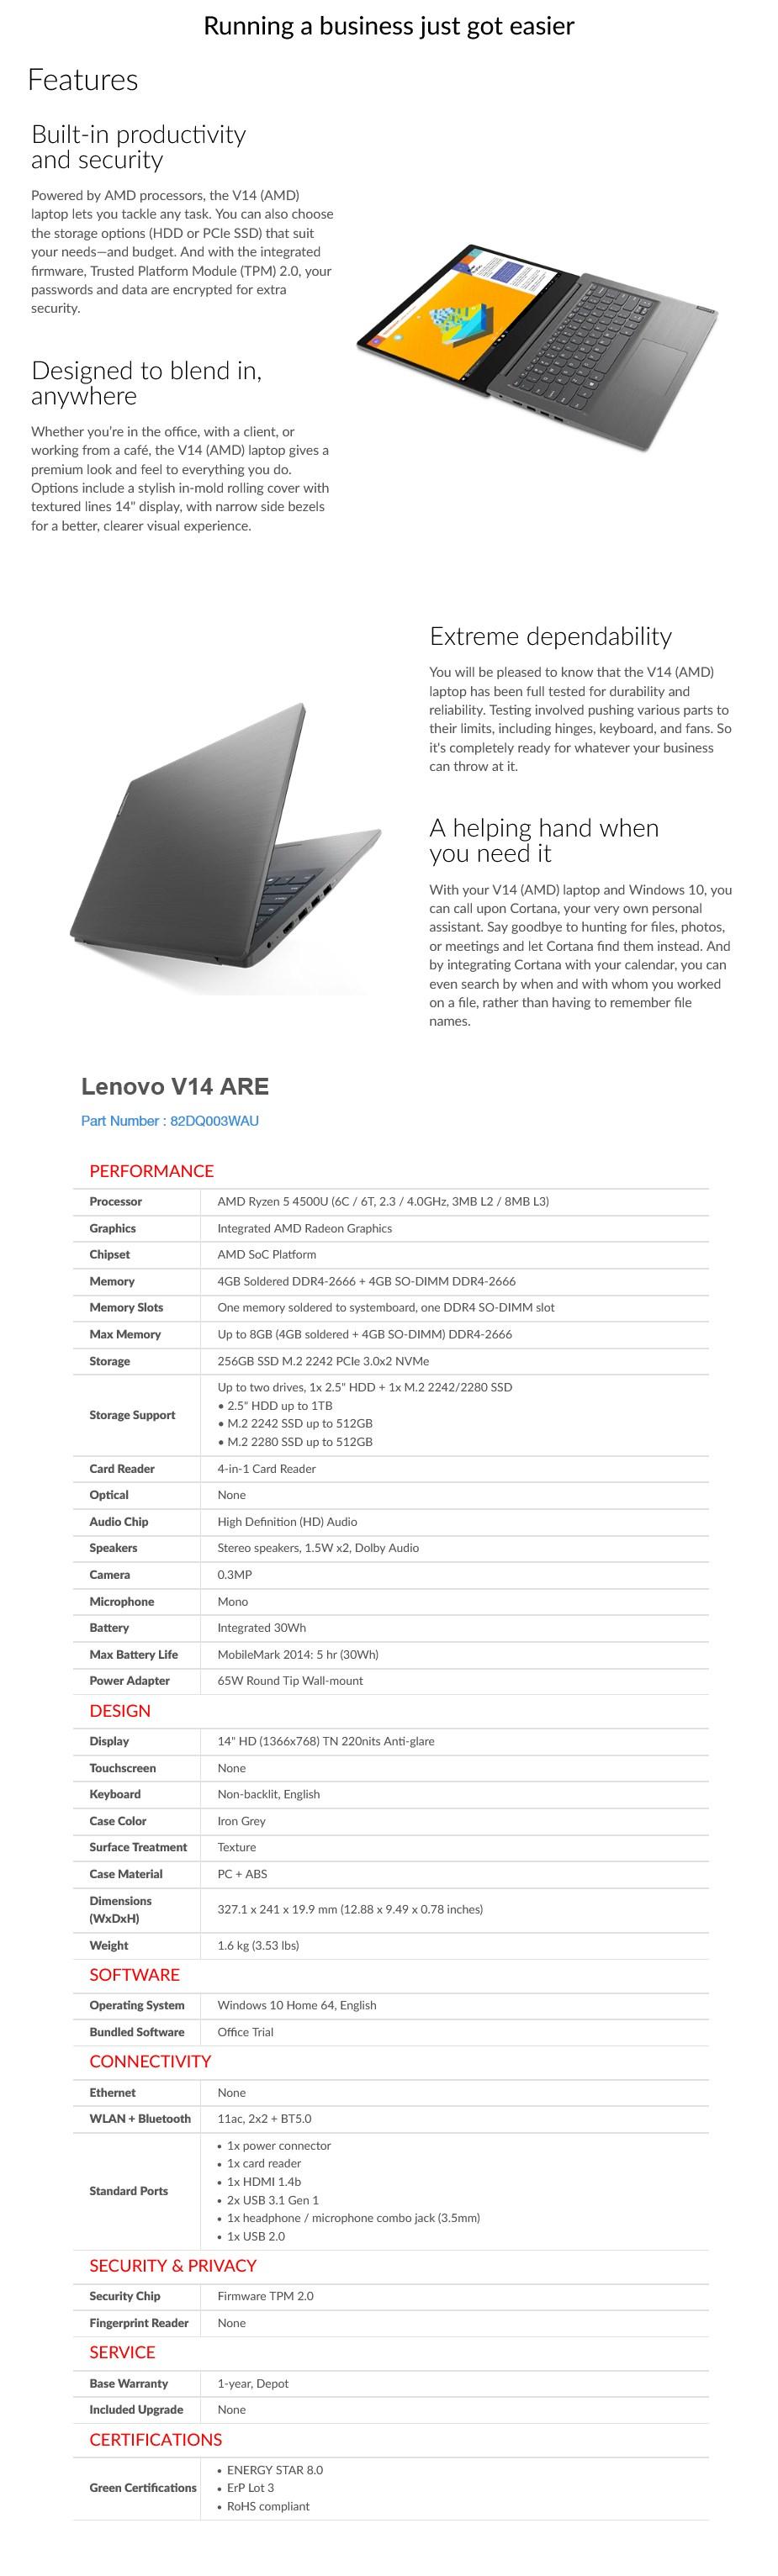 "Lenovo V14-ARE 14"" Laptop R5-4500U 8GB 256GB Win10 Home - Desktop Overview 1"